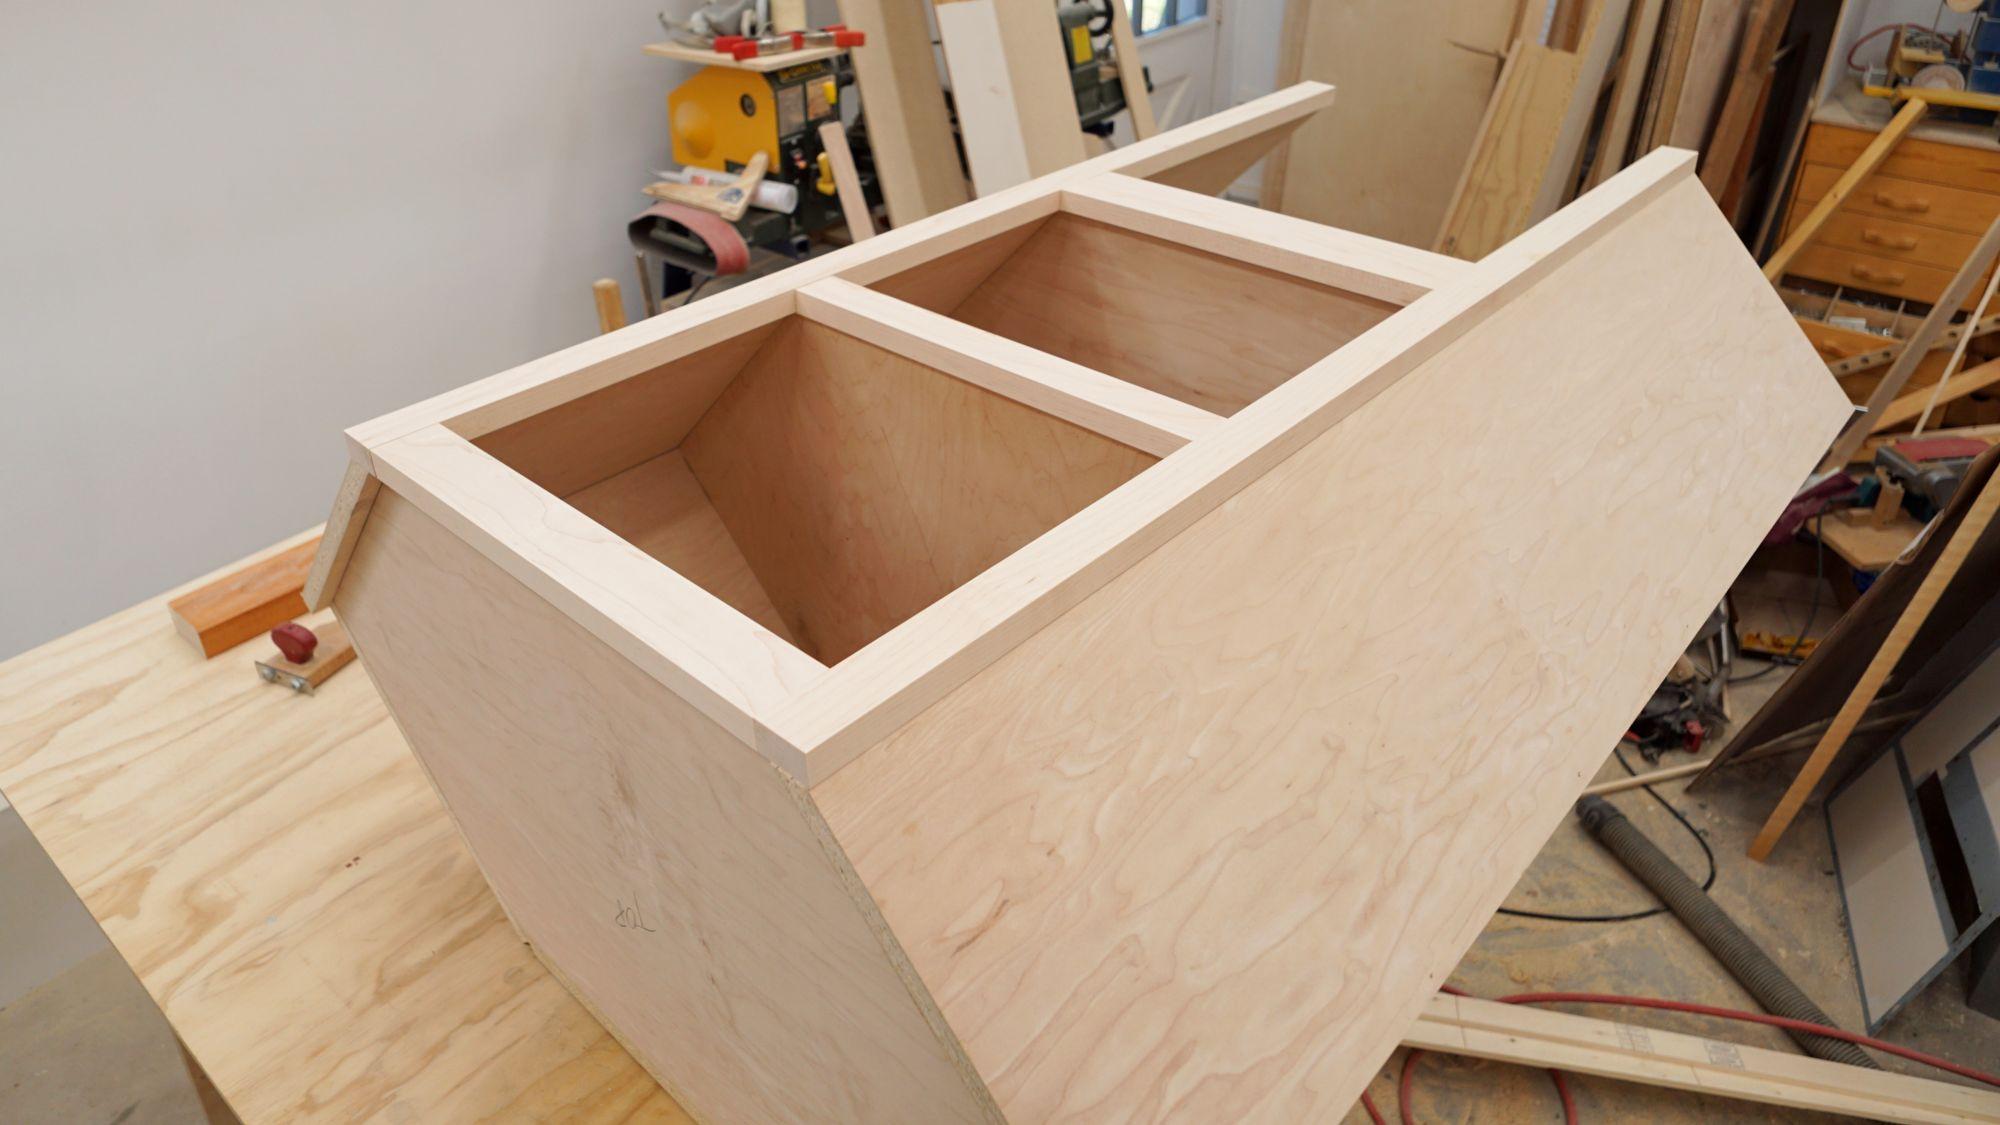 Building A Corner Cabinet For The Kitchen Ibuildit Ca